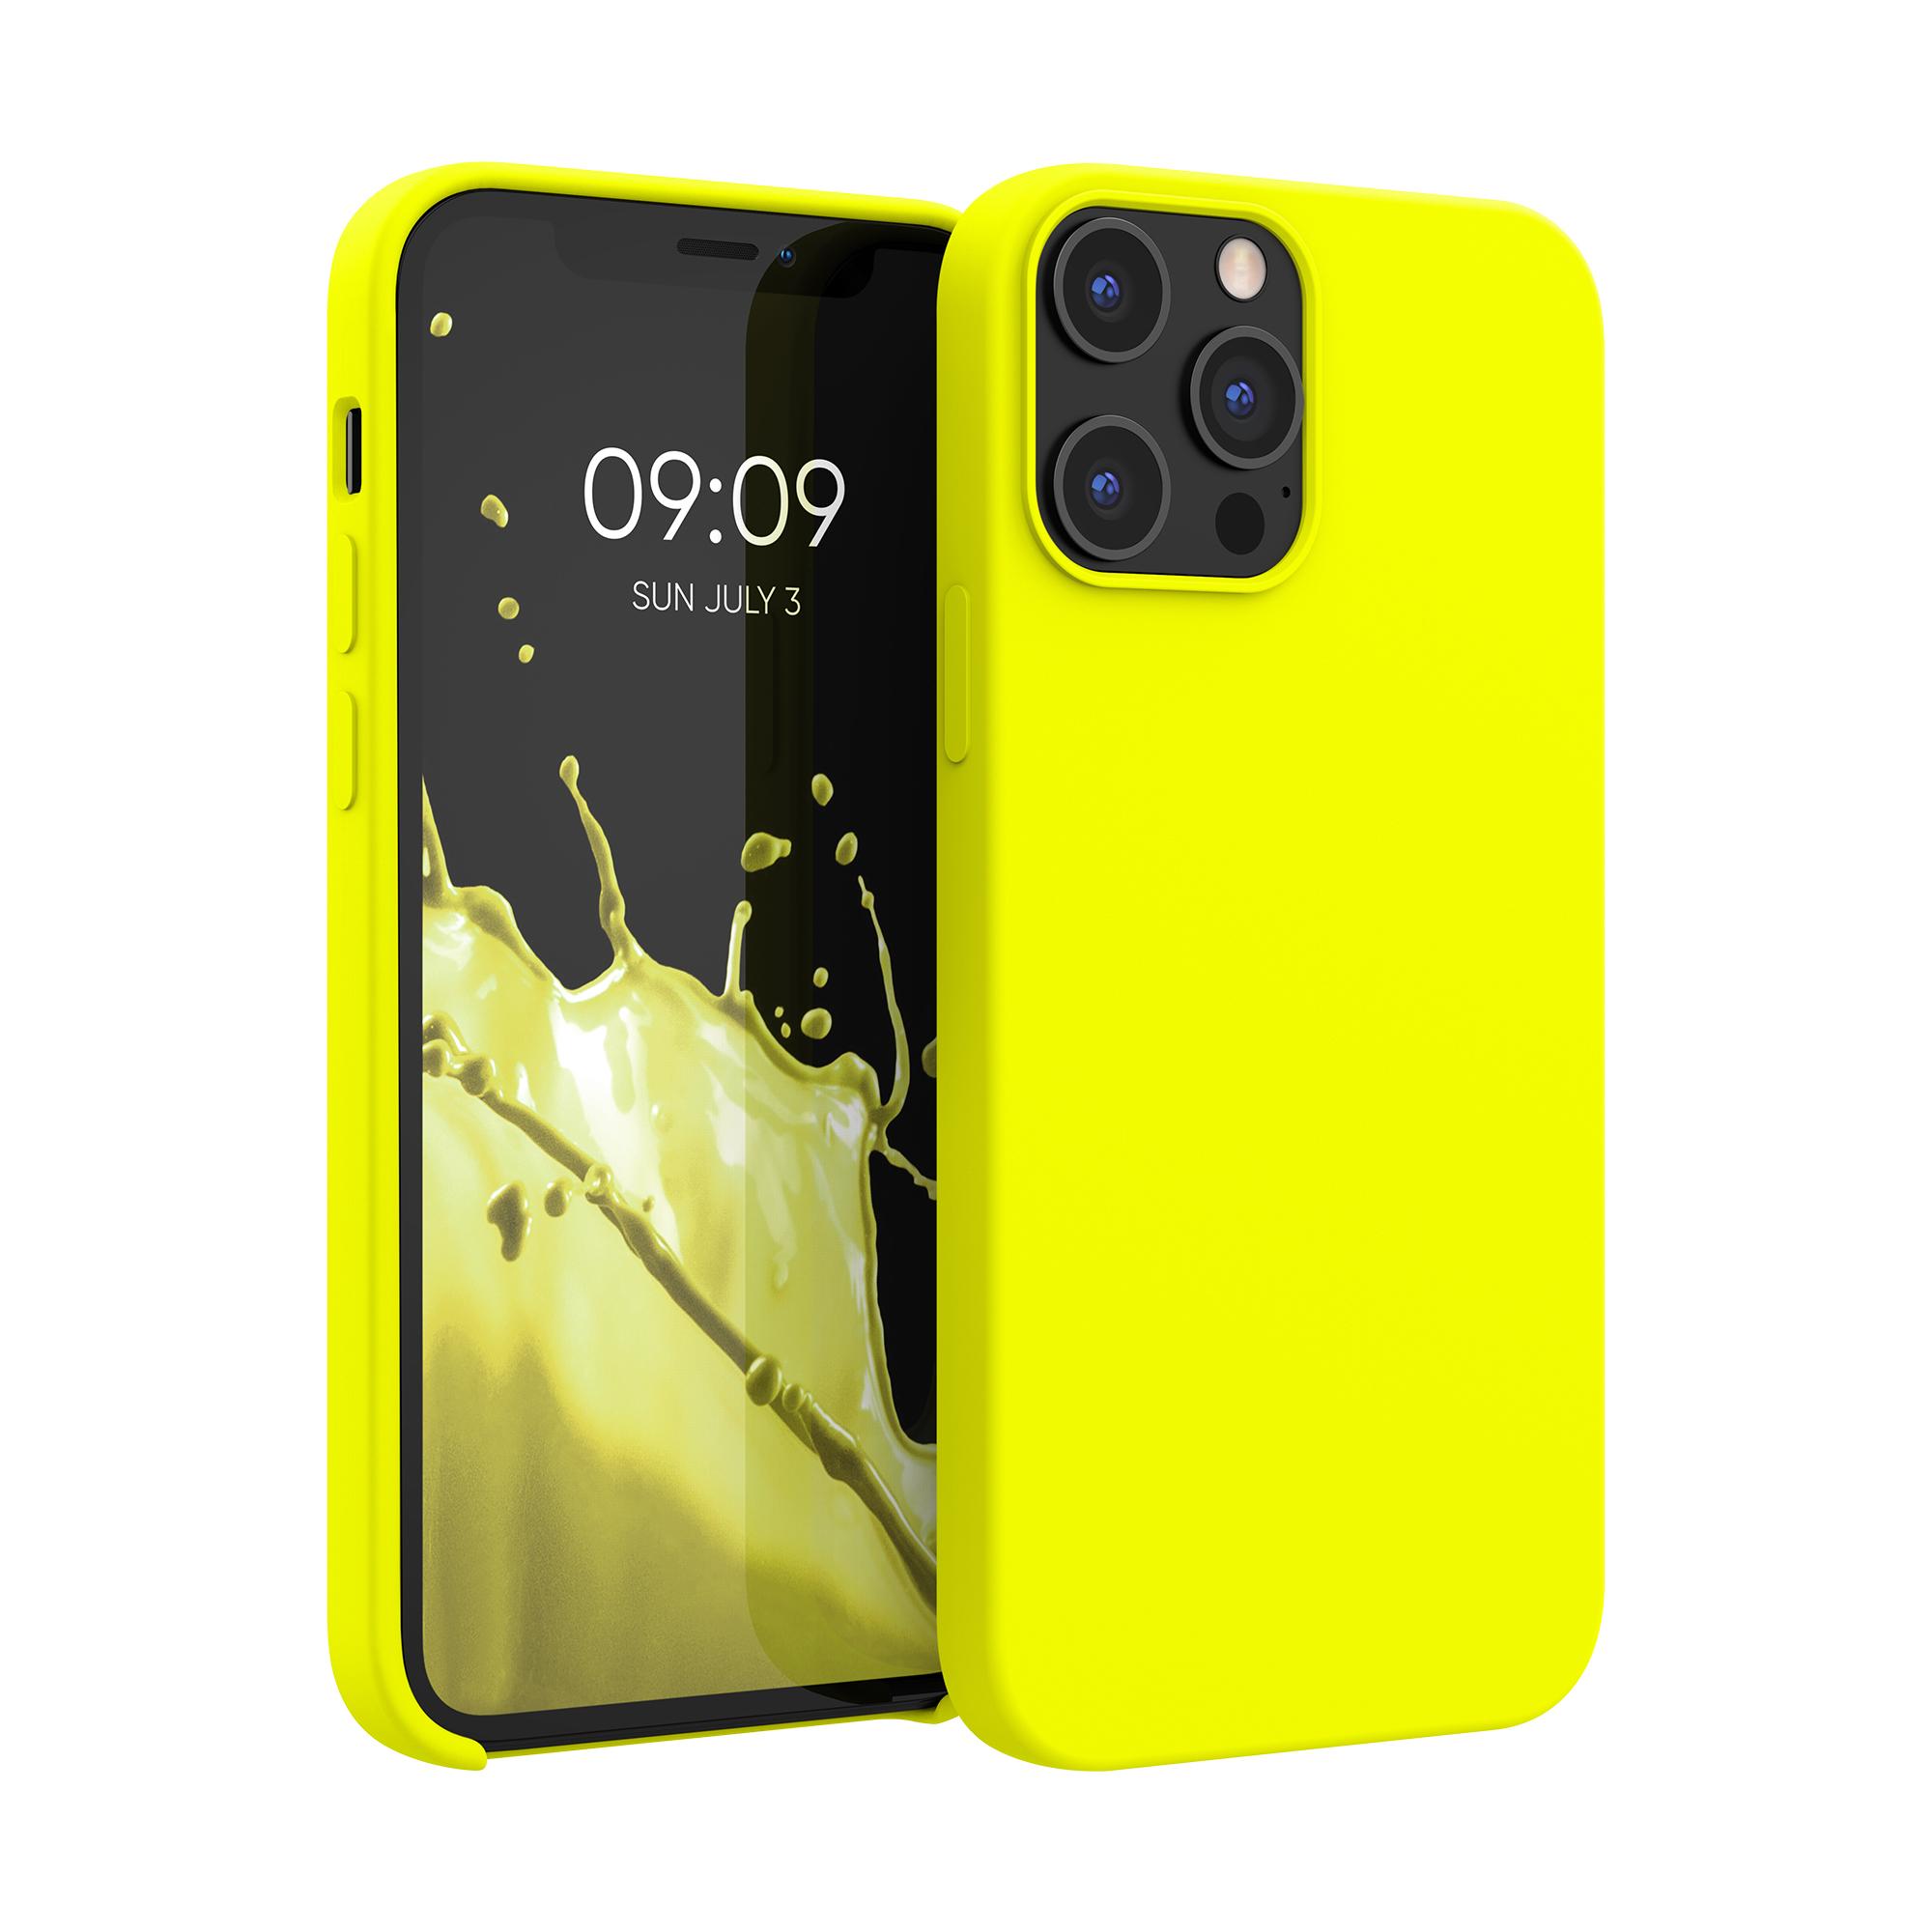 Kvalitní silikonové TPU pouzdro pro Apple iPhone 12 Pro Max - Lemon Yellow